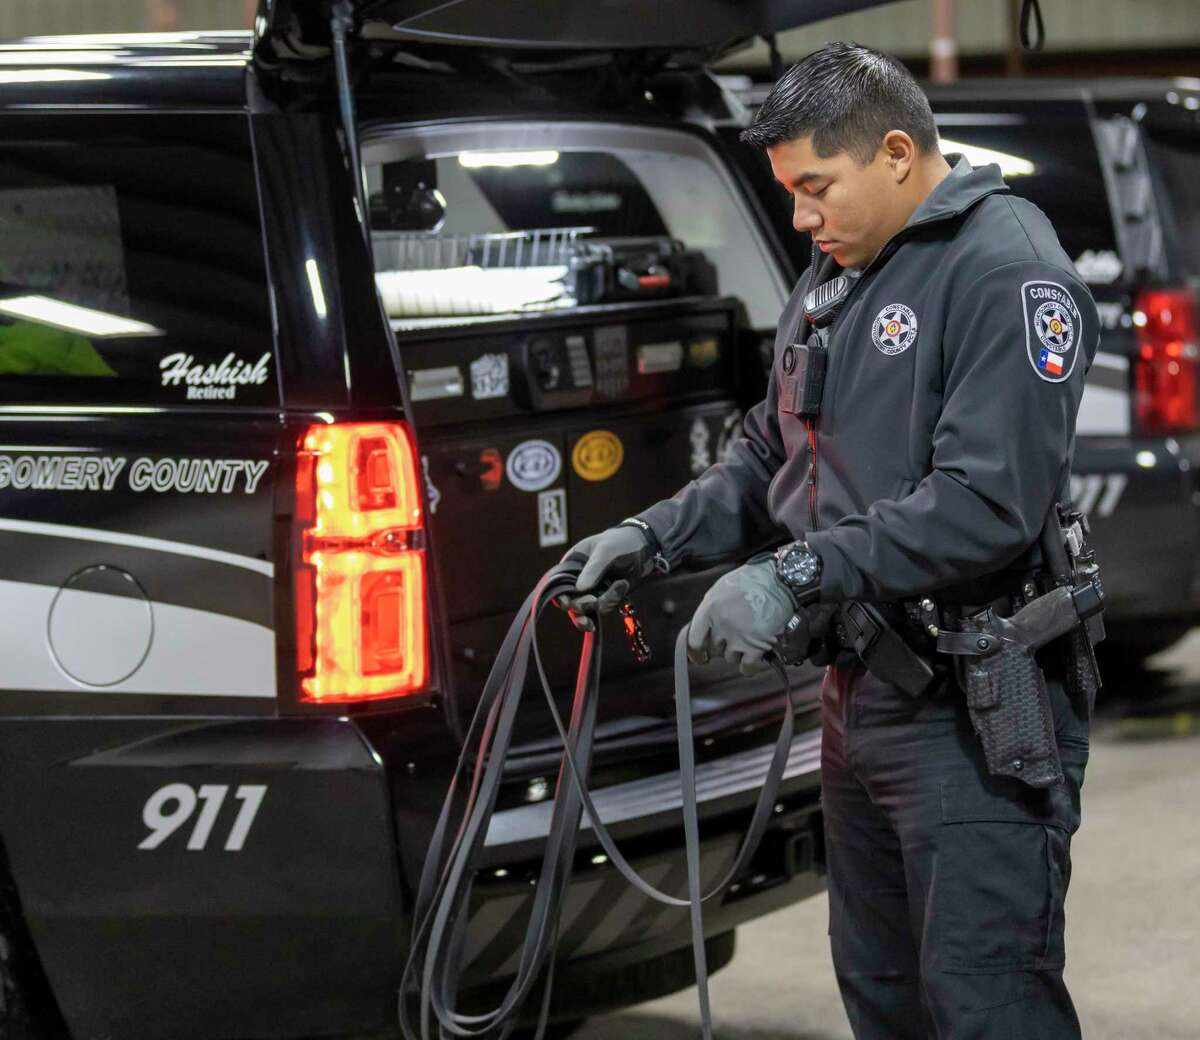 Montgomery County Precinct 4's Constable's K-9 Deputy Rai Duenas prepares a leash for training in New Caney, Wednesday, Jan. 29, 2020.